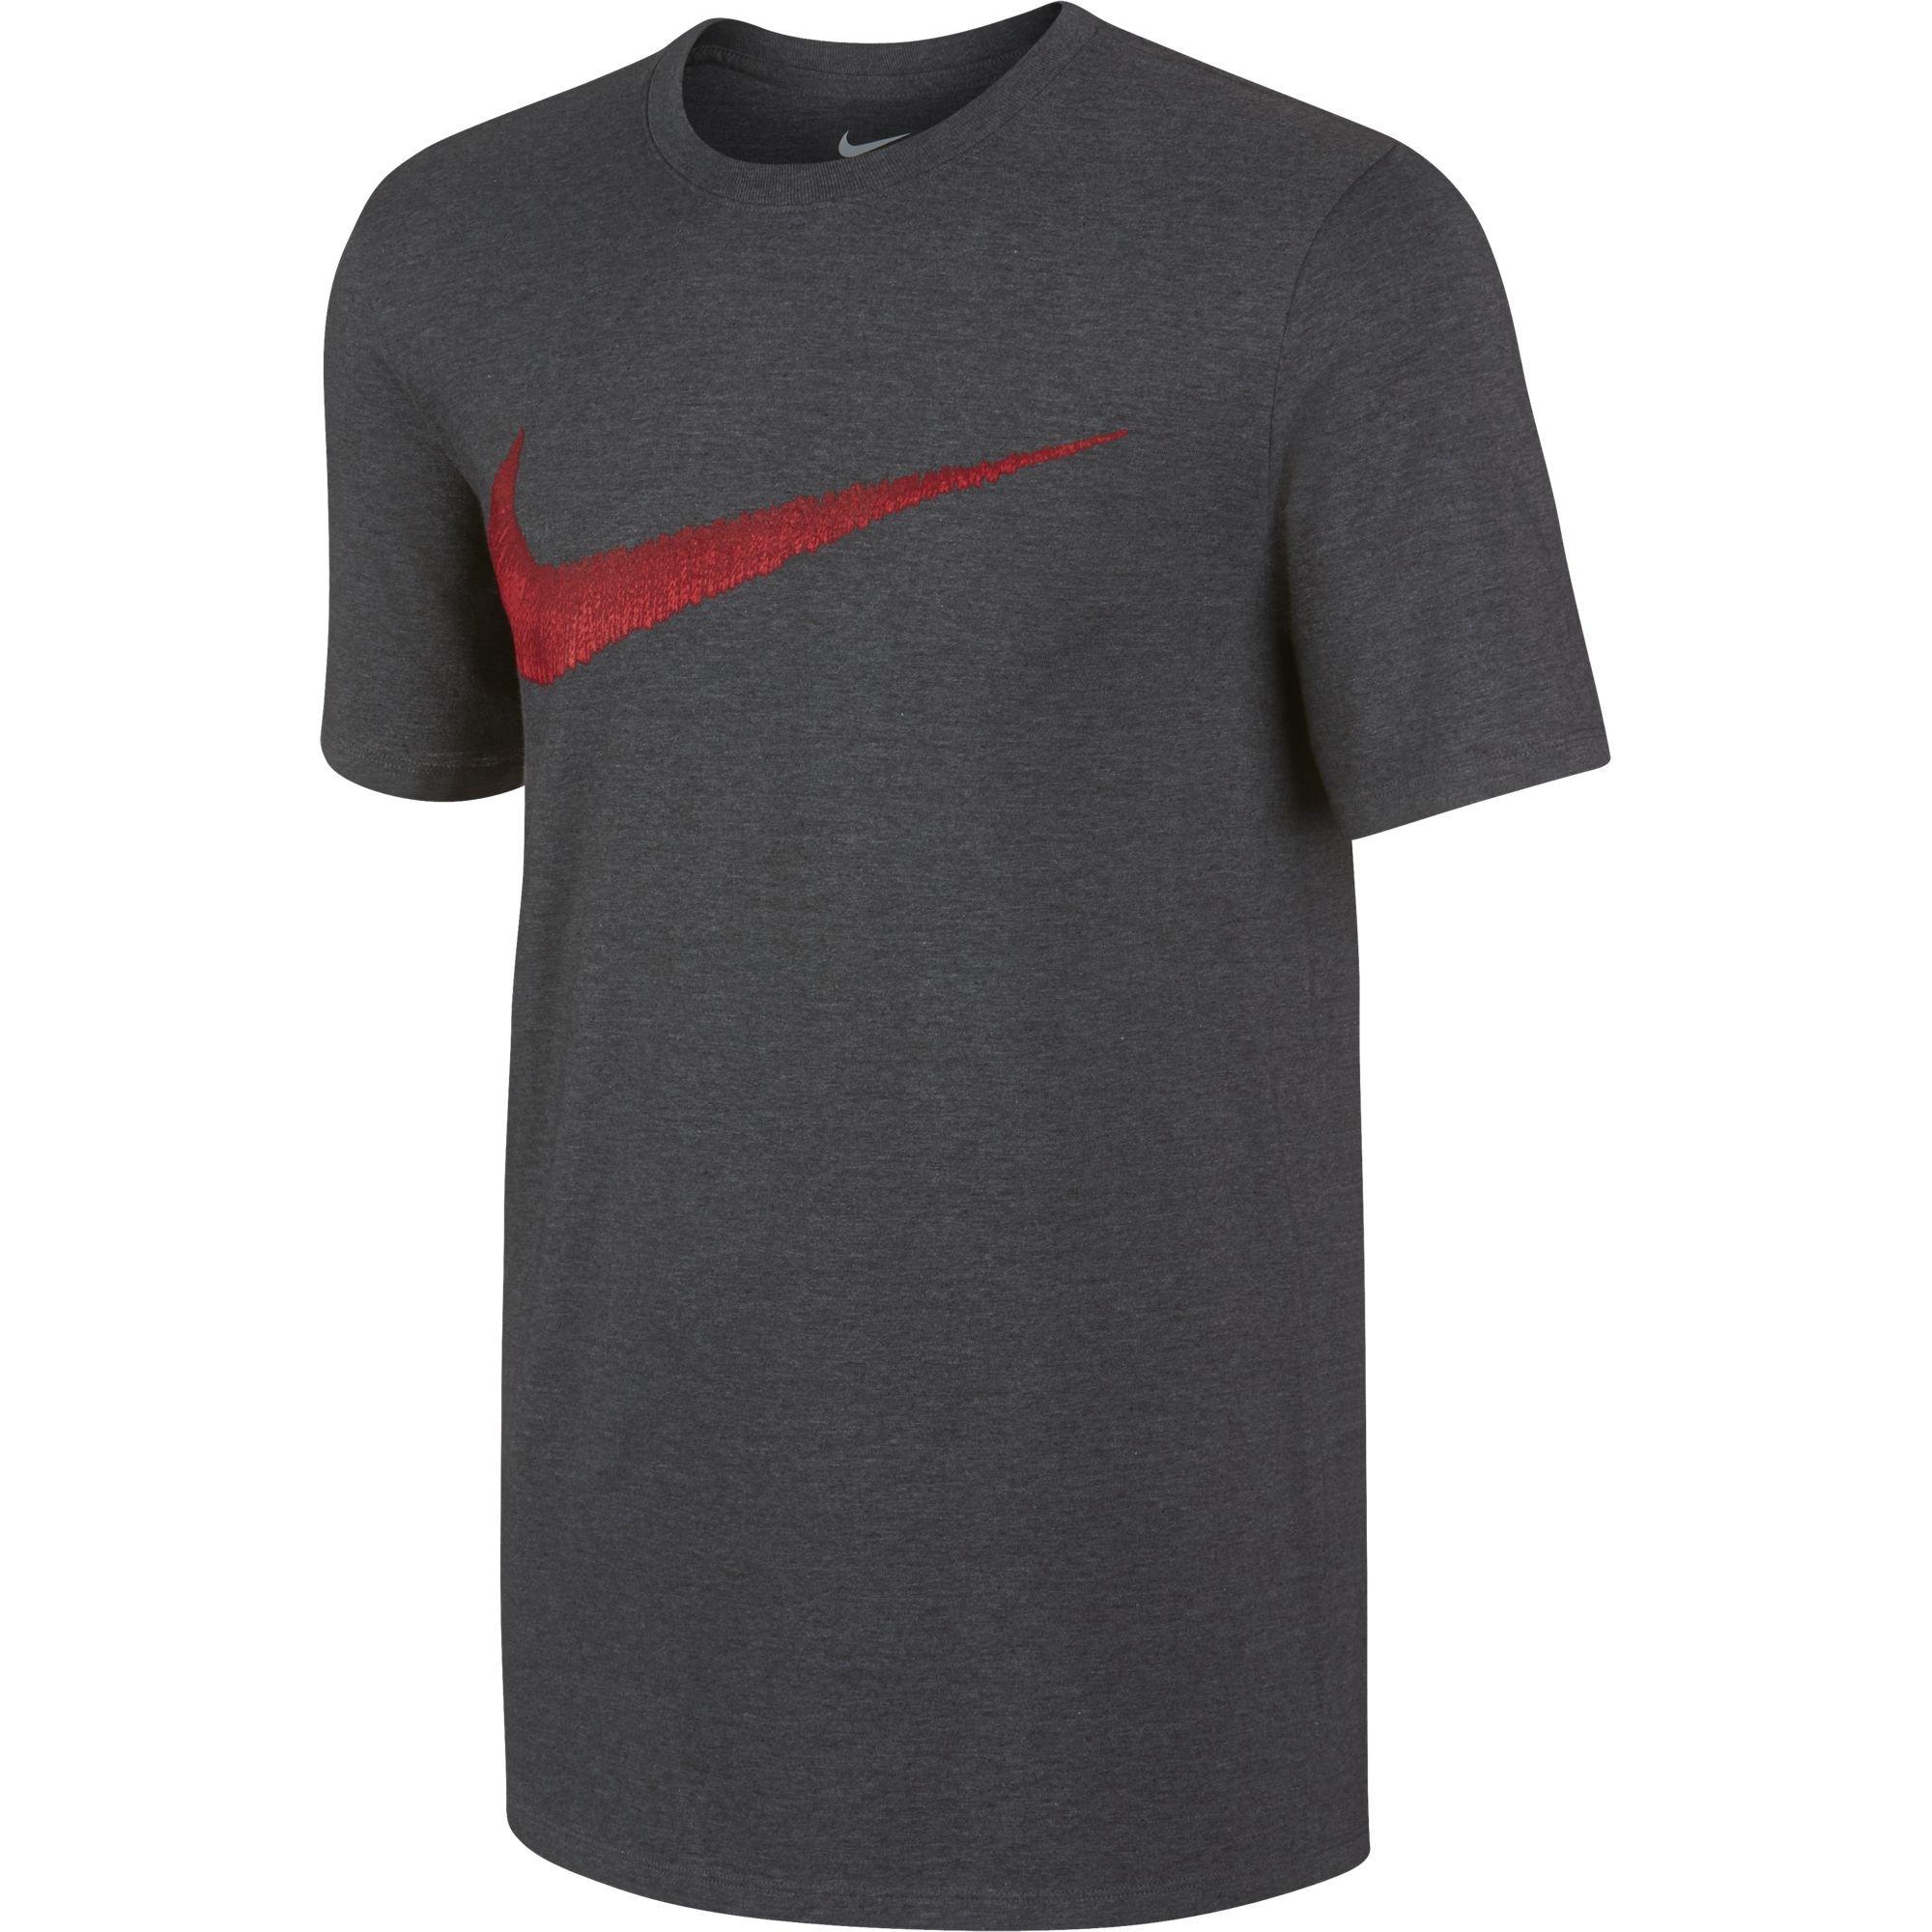 NIKE Sportswear Men's Hangtag Swoosh Tee, Charcoal Heather/University Red, Small